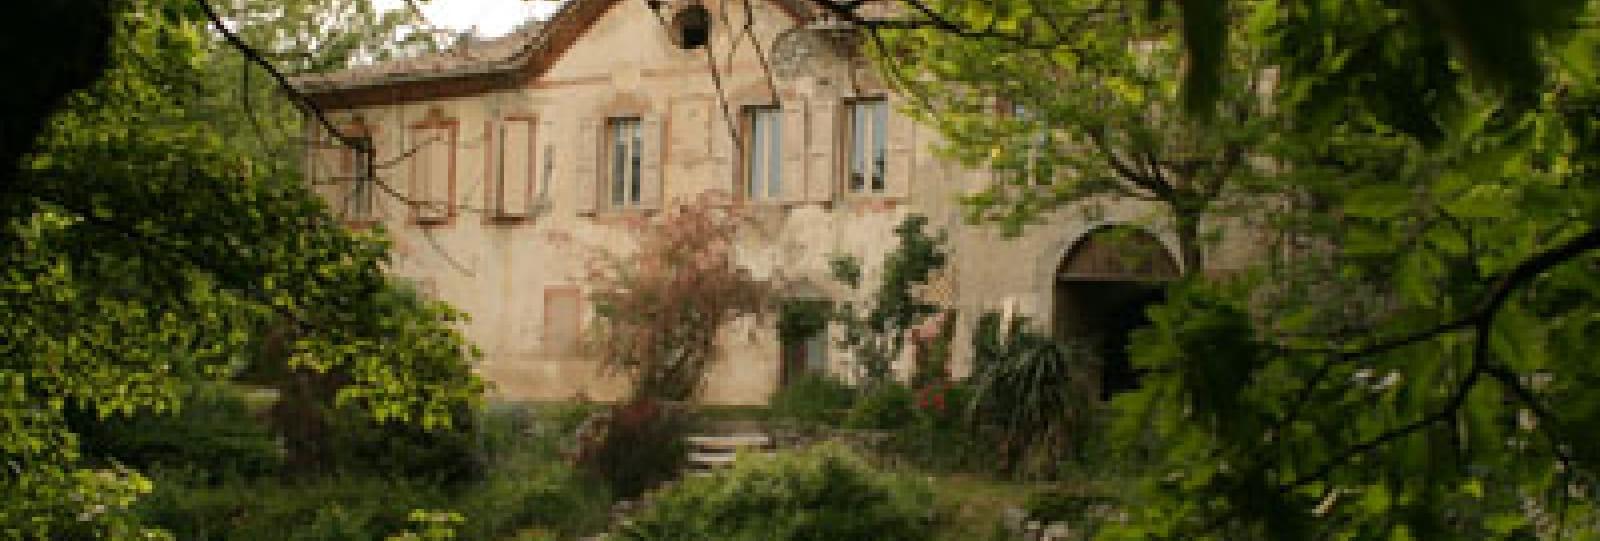 Sebald Bernadette - Gîte Les Restanques